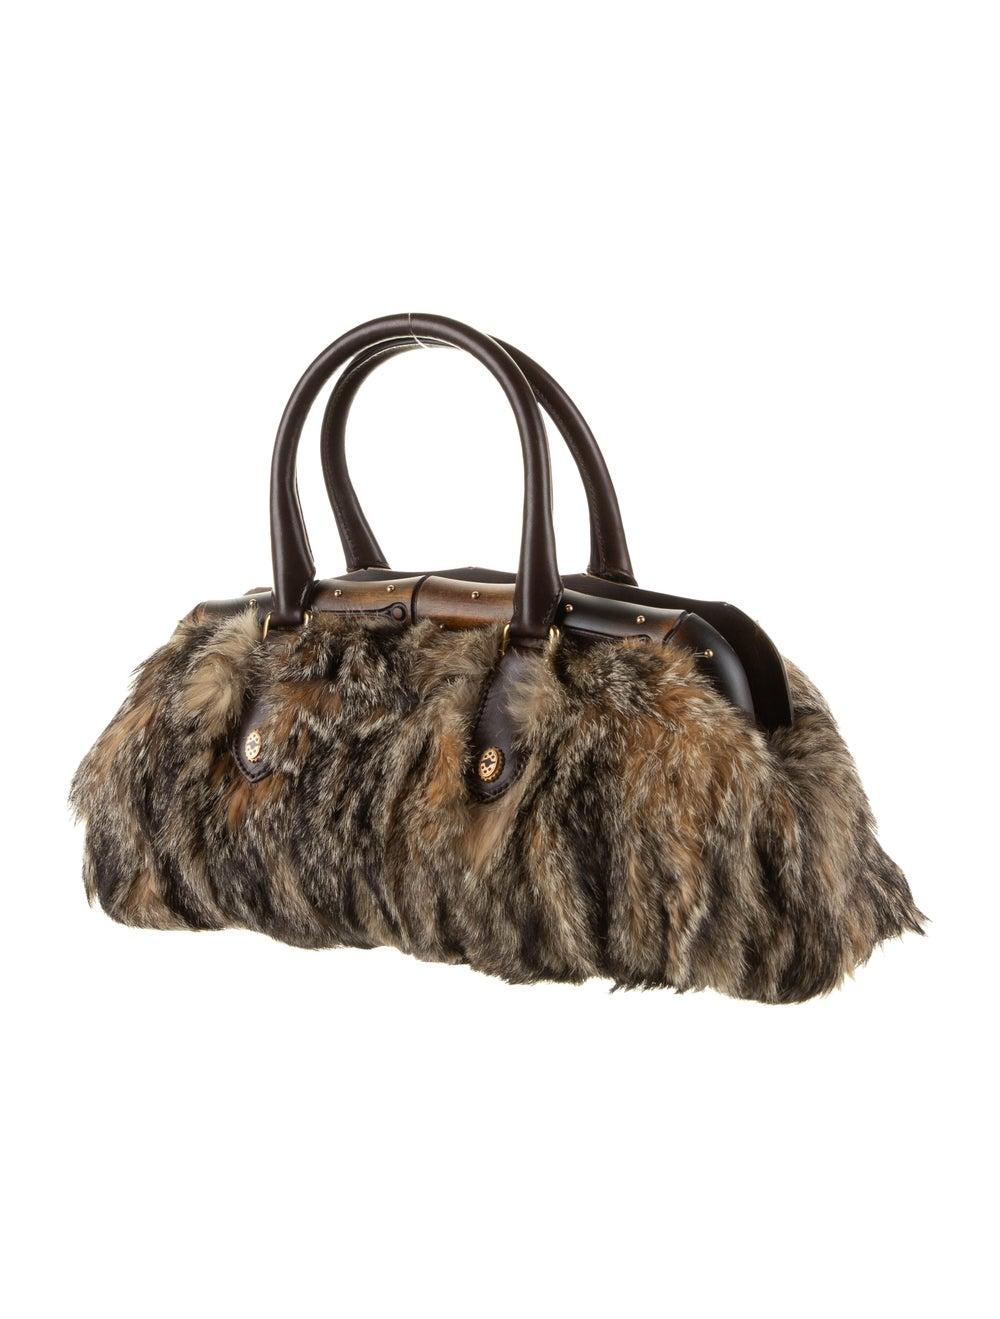 Gucci Fur Bamboo Frame Handle Bag Gold - image 3